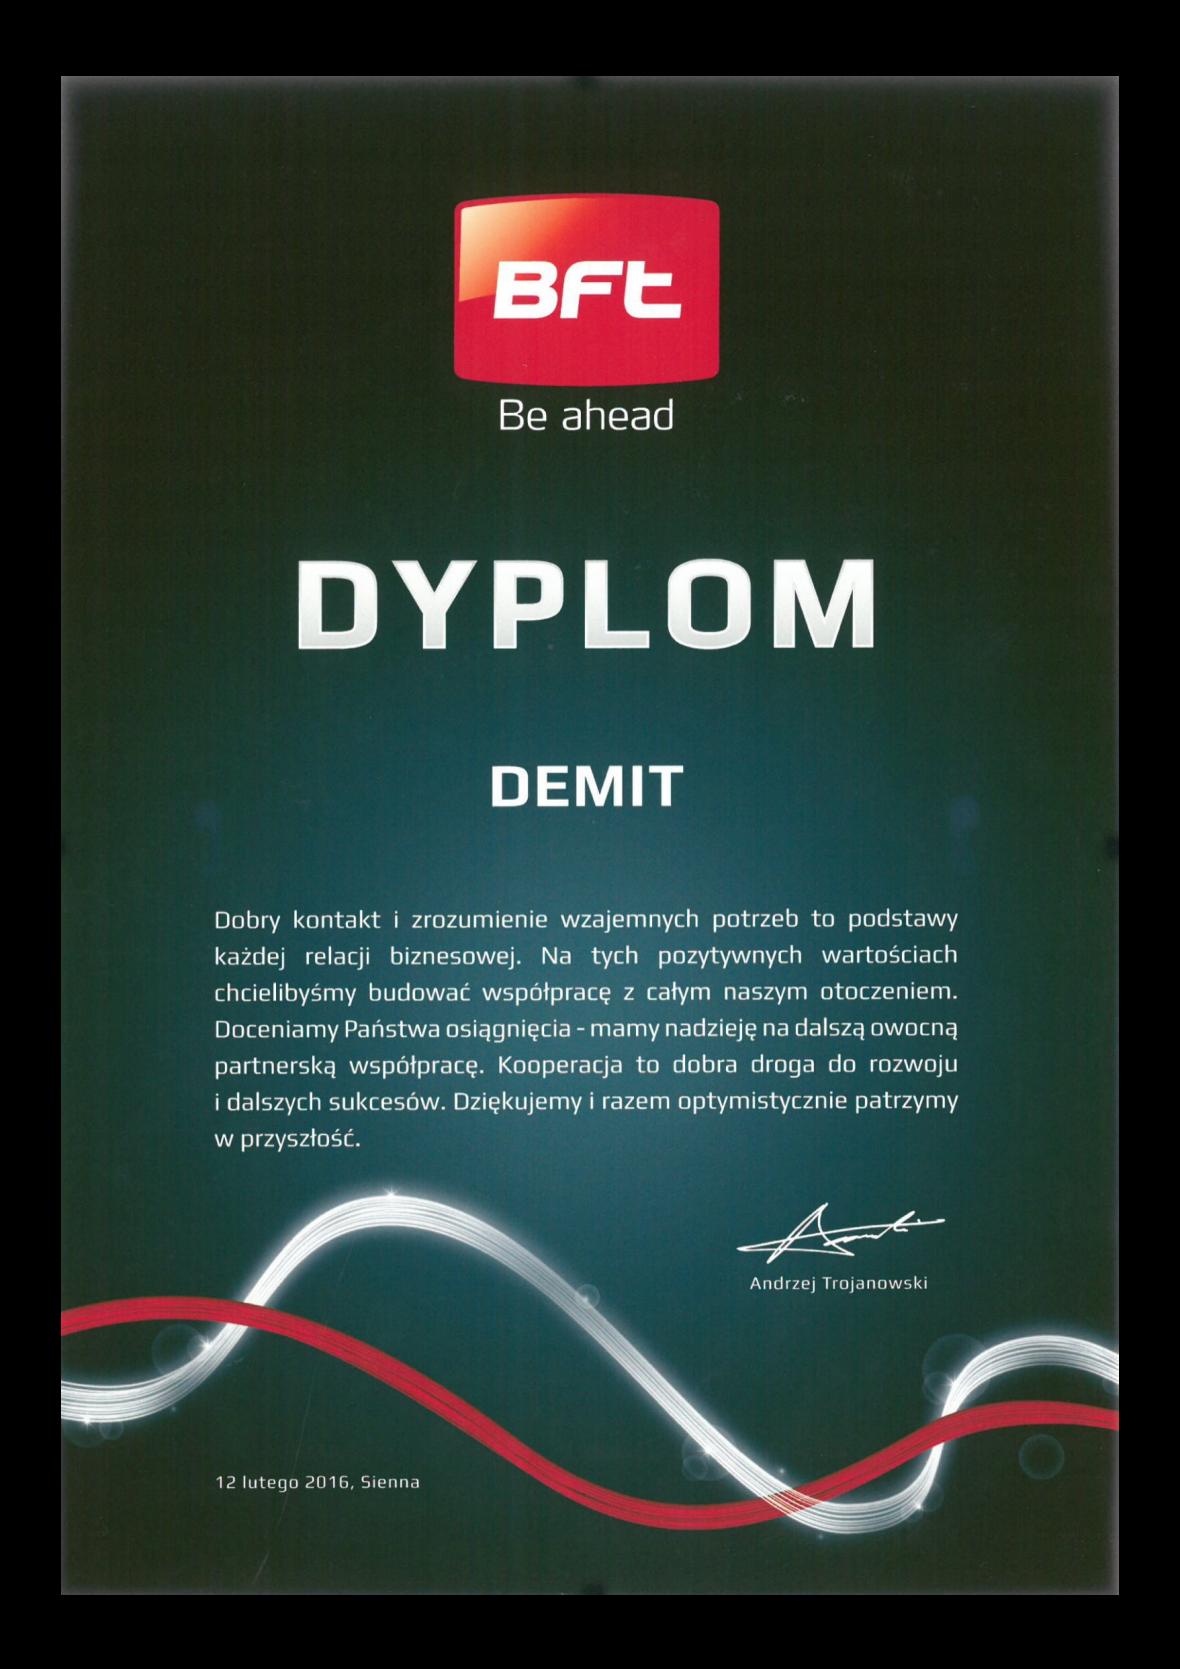 Dyplom BFT dla DEMIT